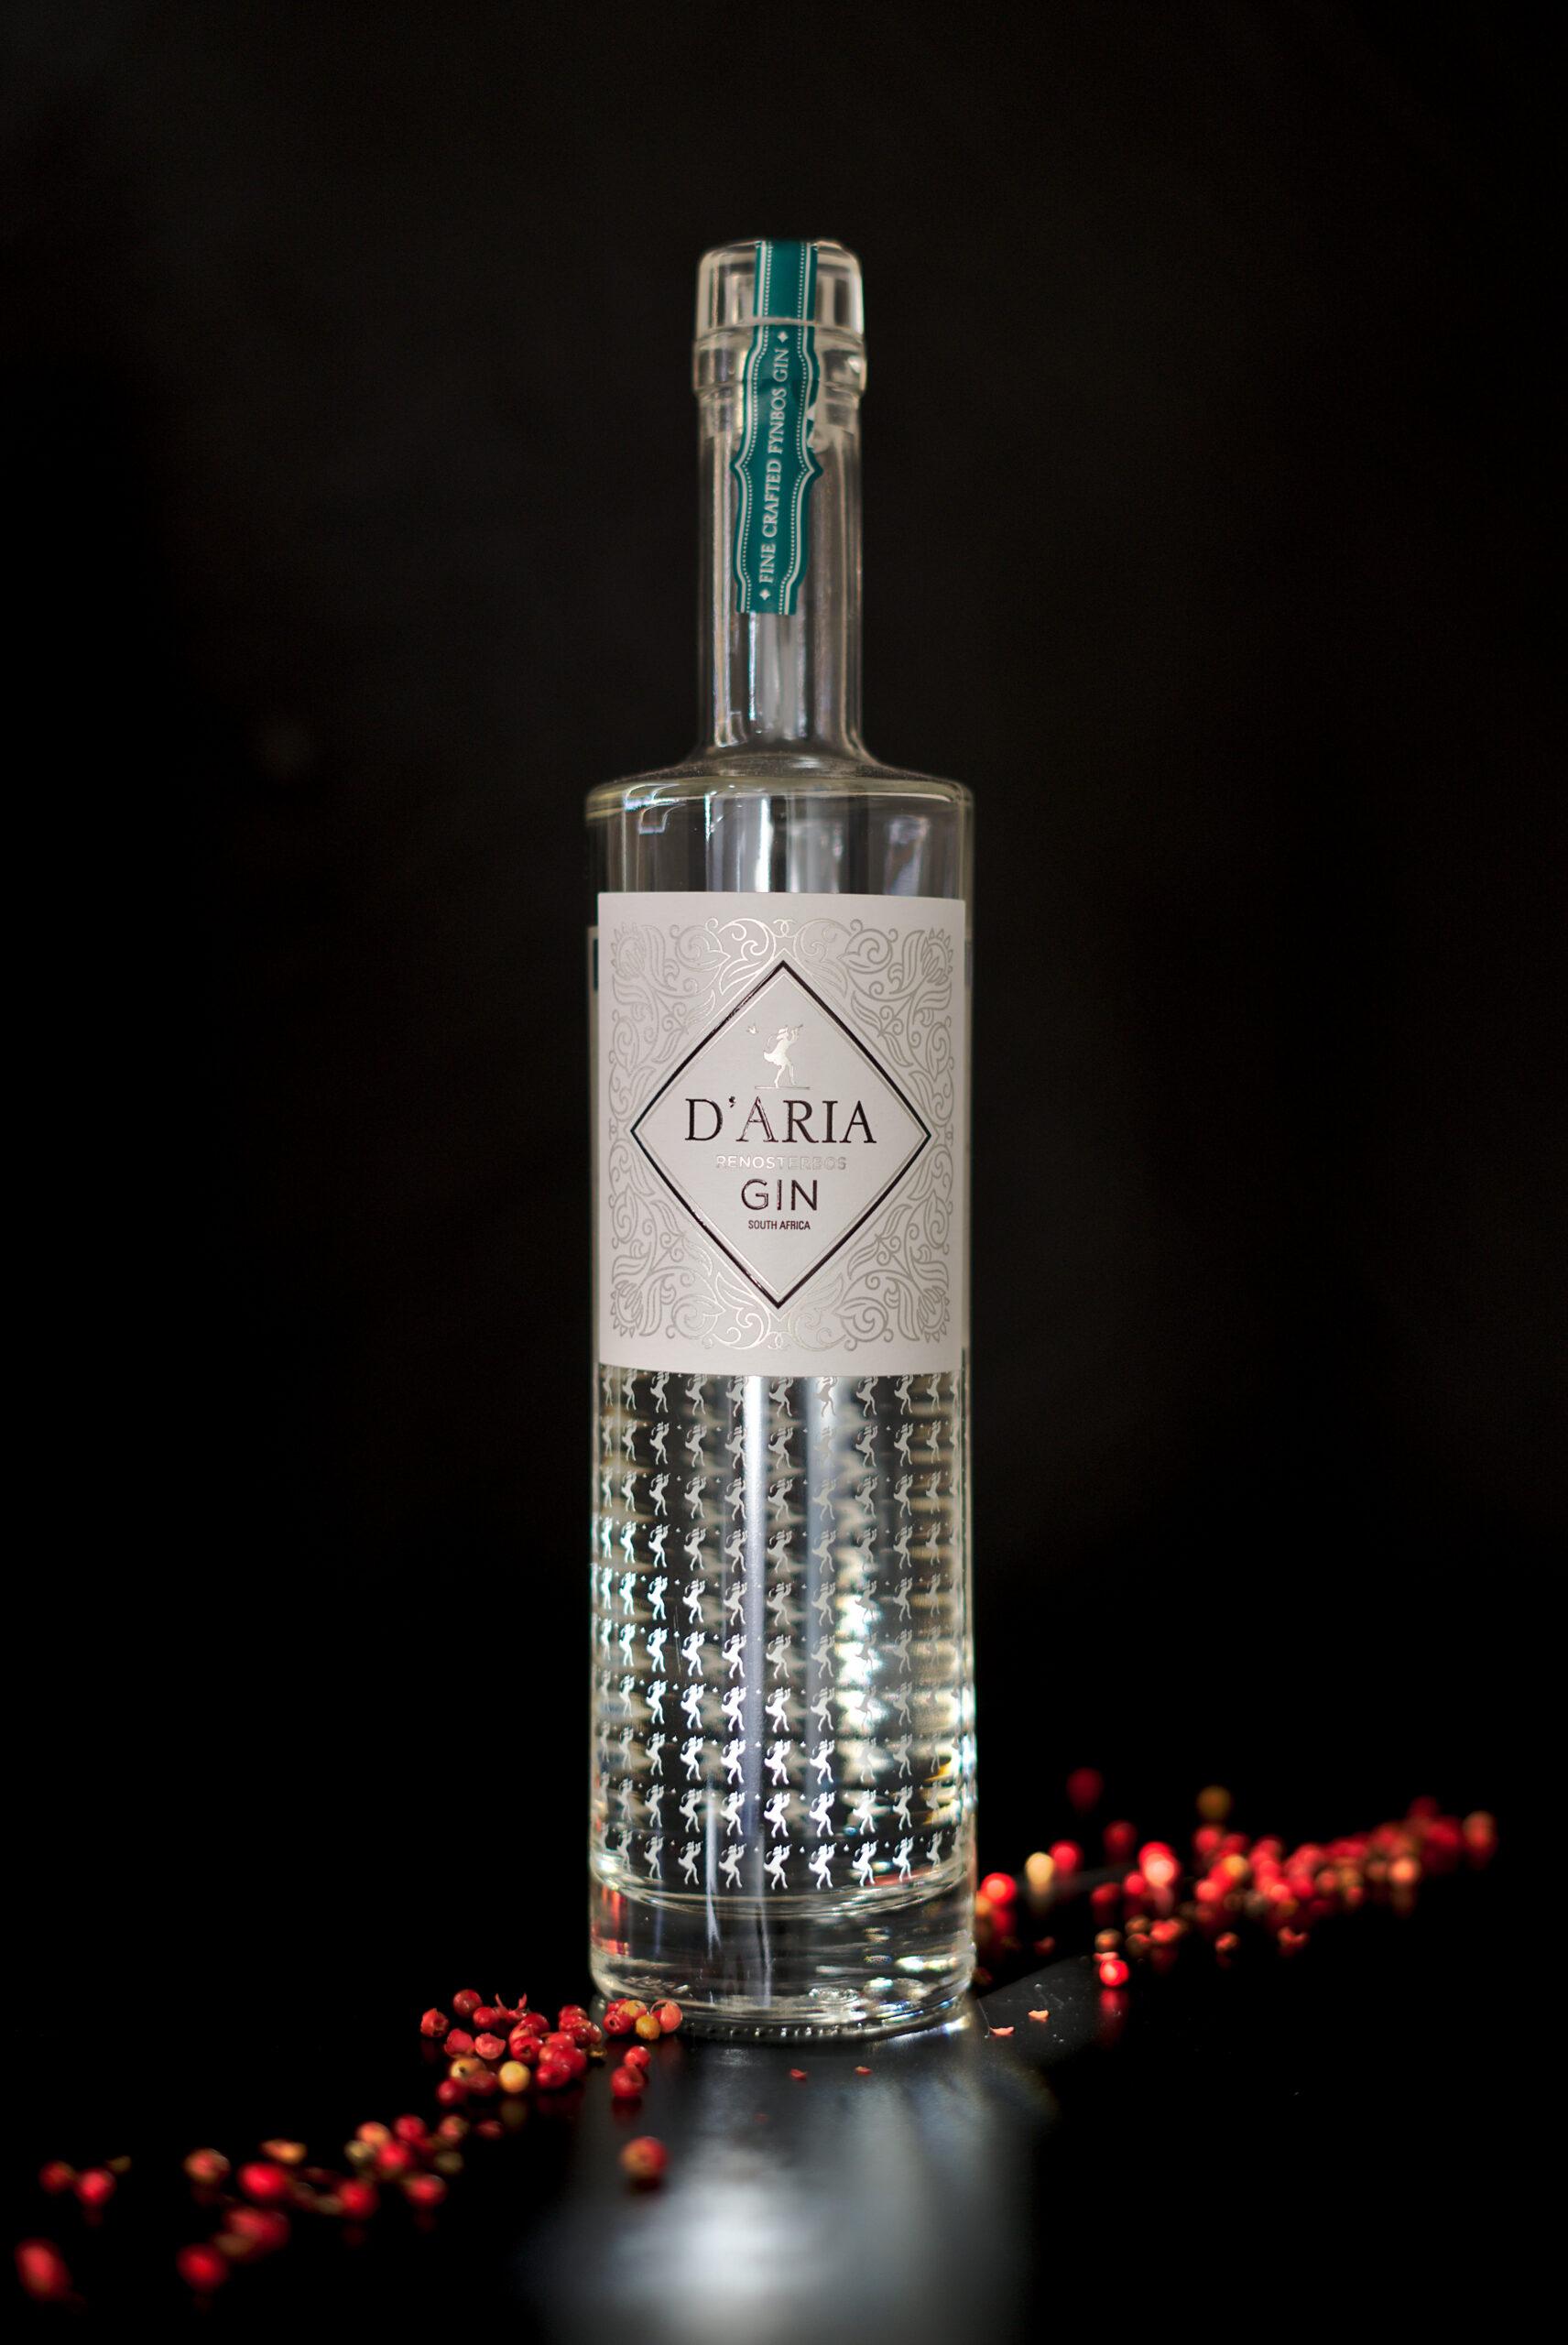 D'Aria Renosterbos Gin